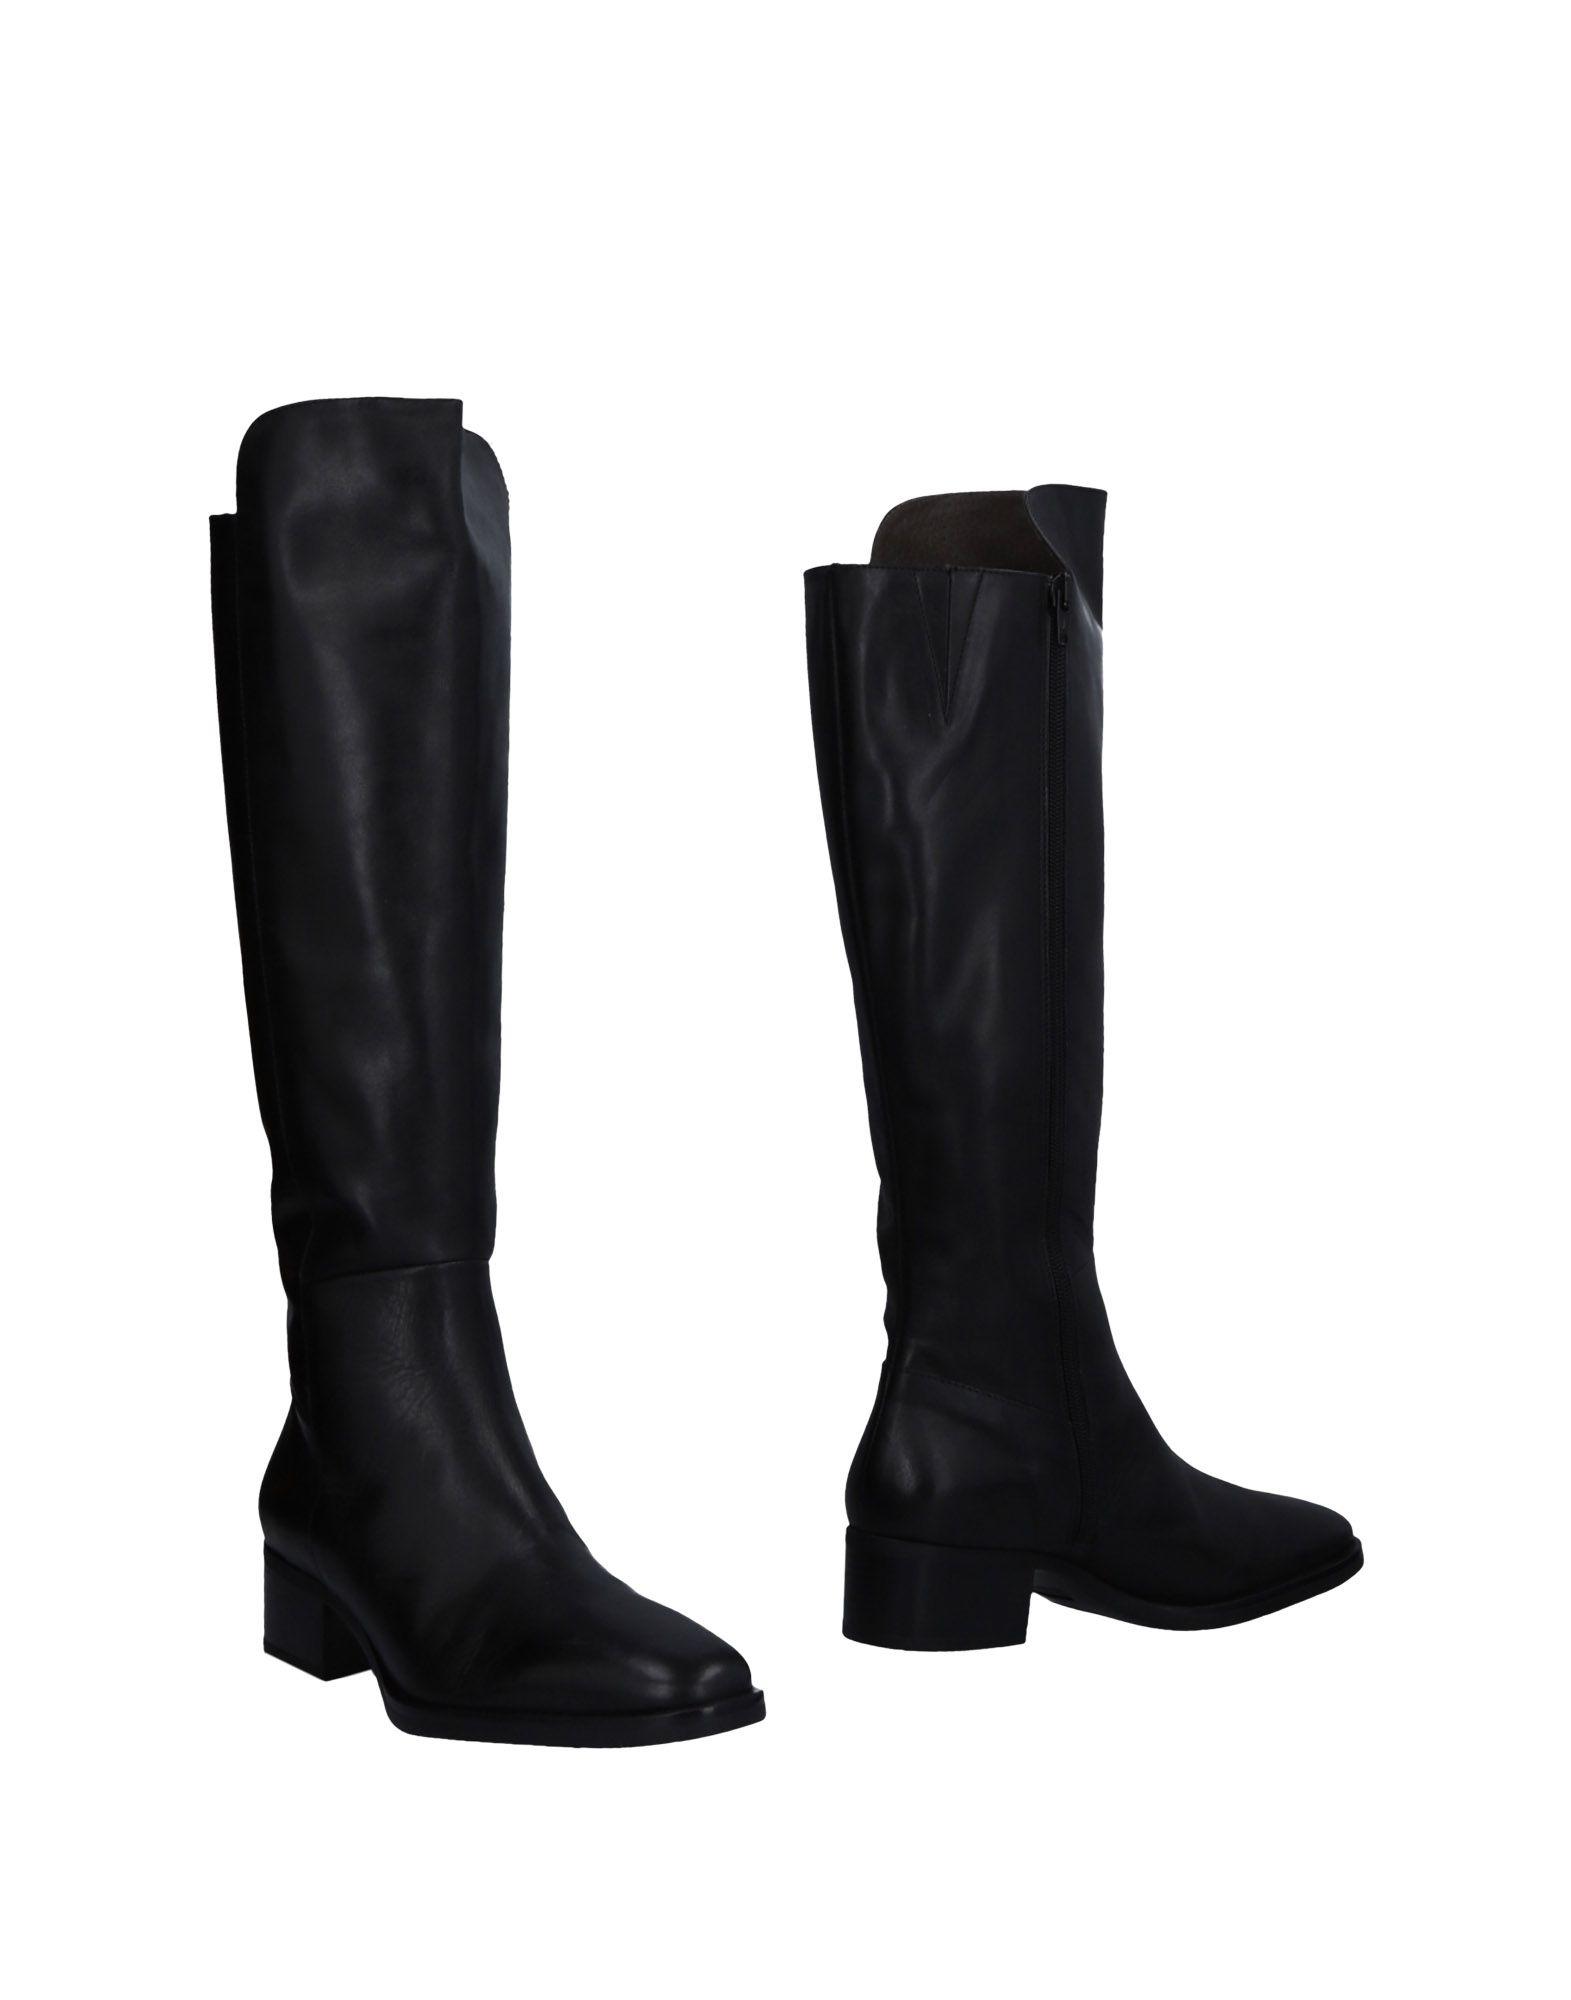 Paola Ferri Boots - Women on Paola Ferri Boots online on Women  Australia - 11475814JF 79e36a